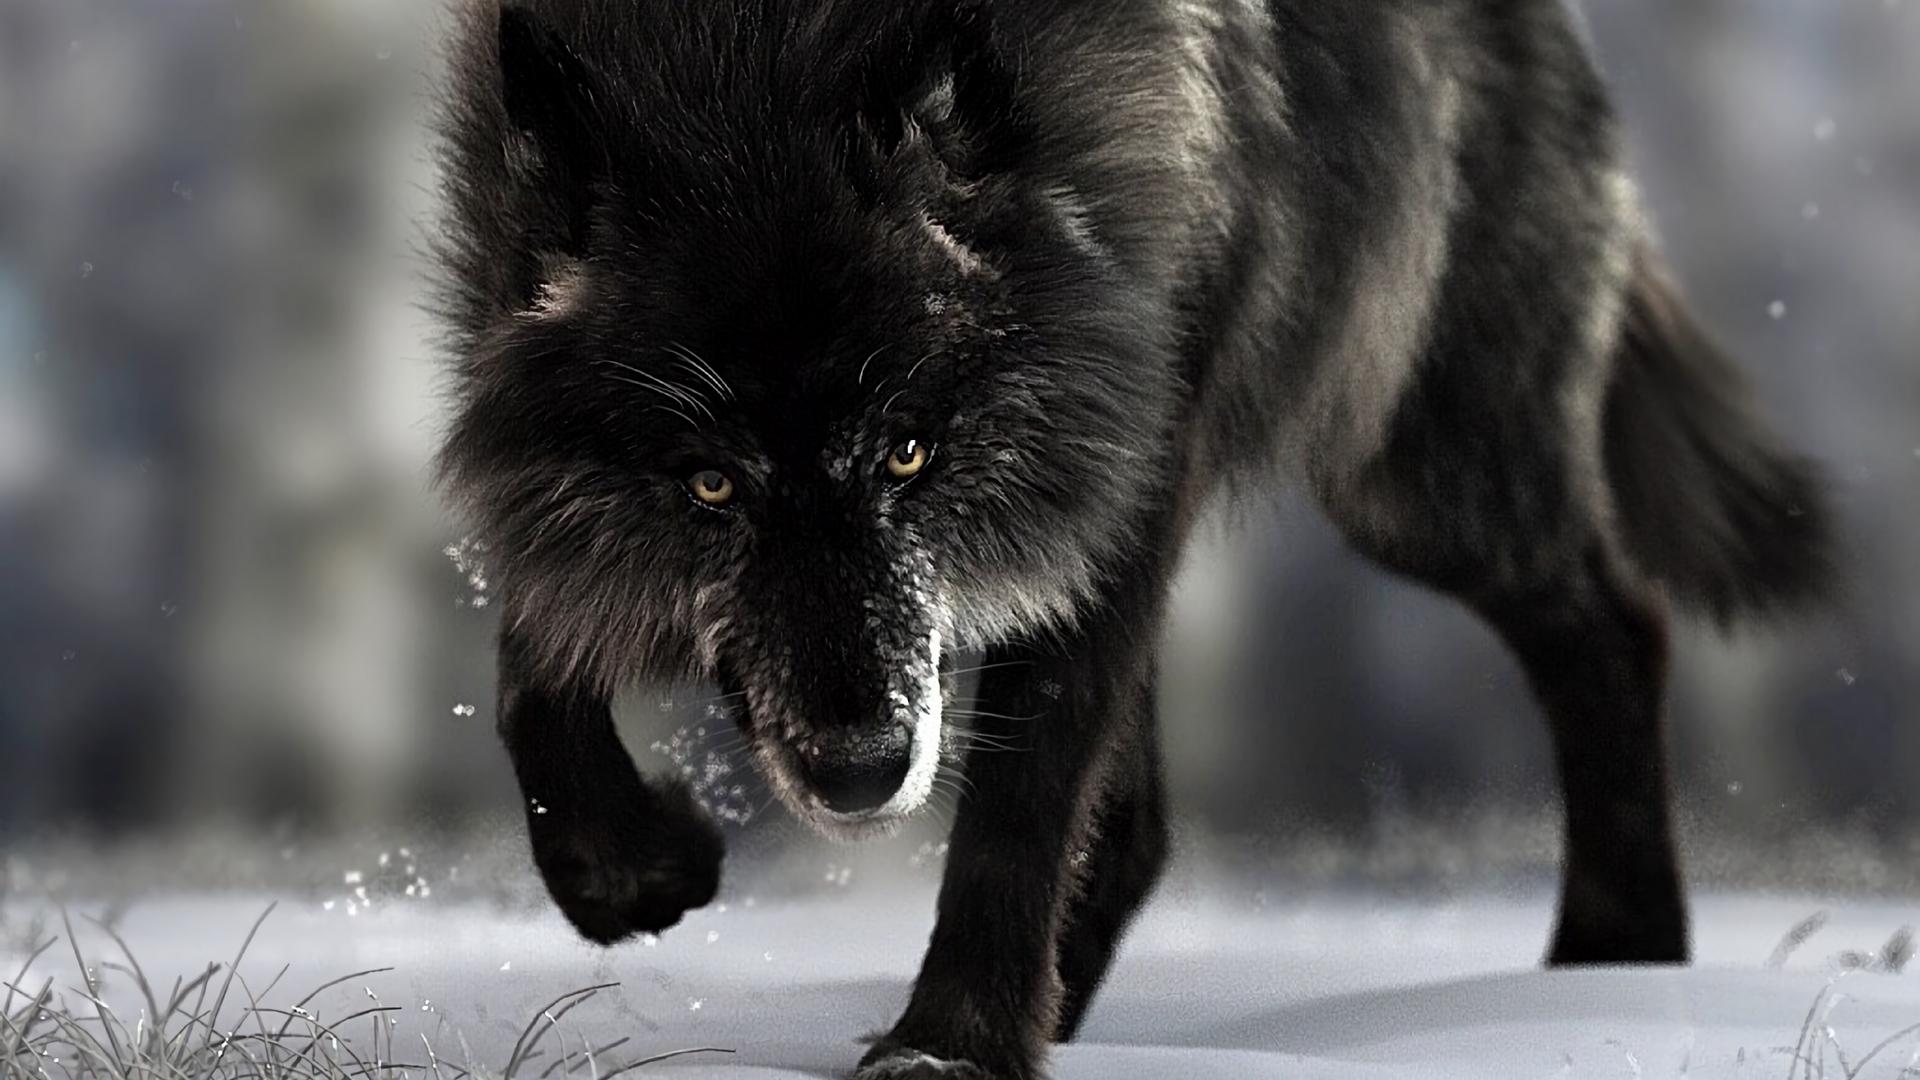 Wallpaper Wolf Predator Black Wildlife Dog Black Wolf 1920x1080 Wallpaper Teahub Io